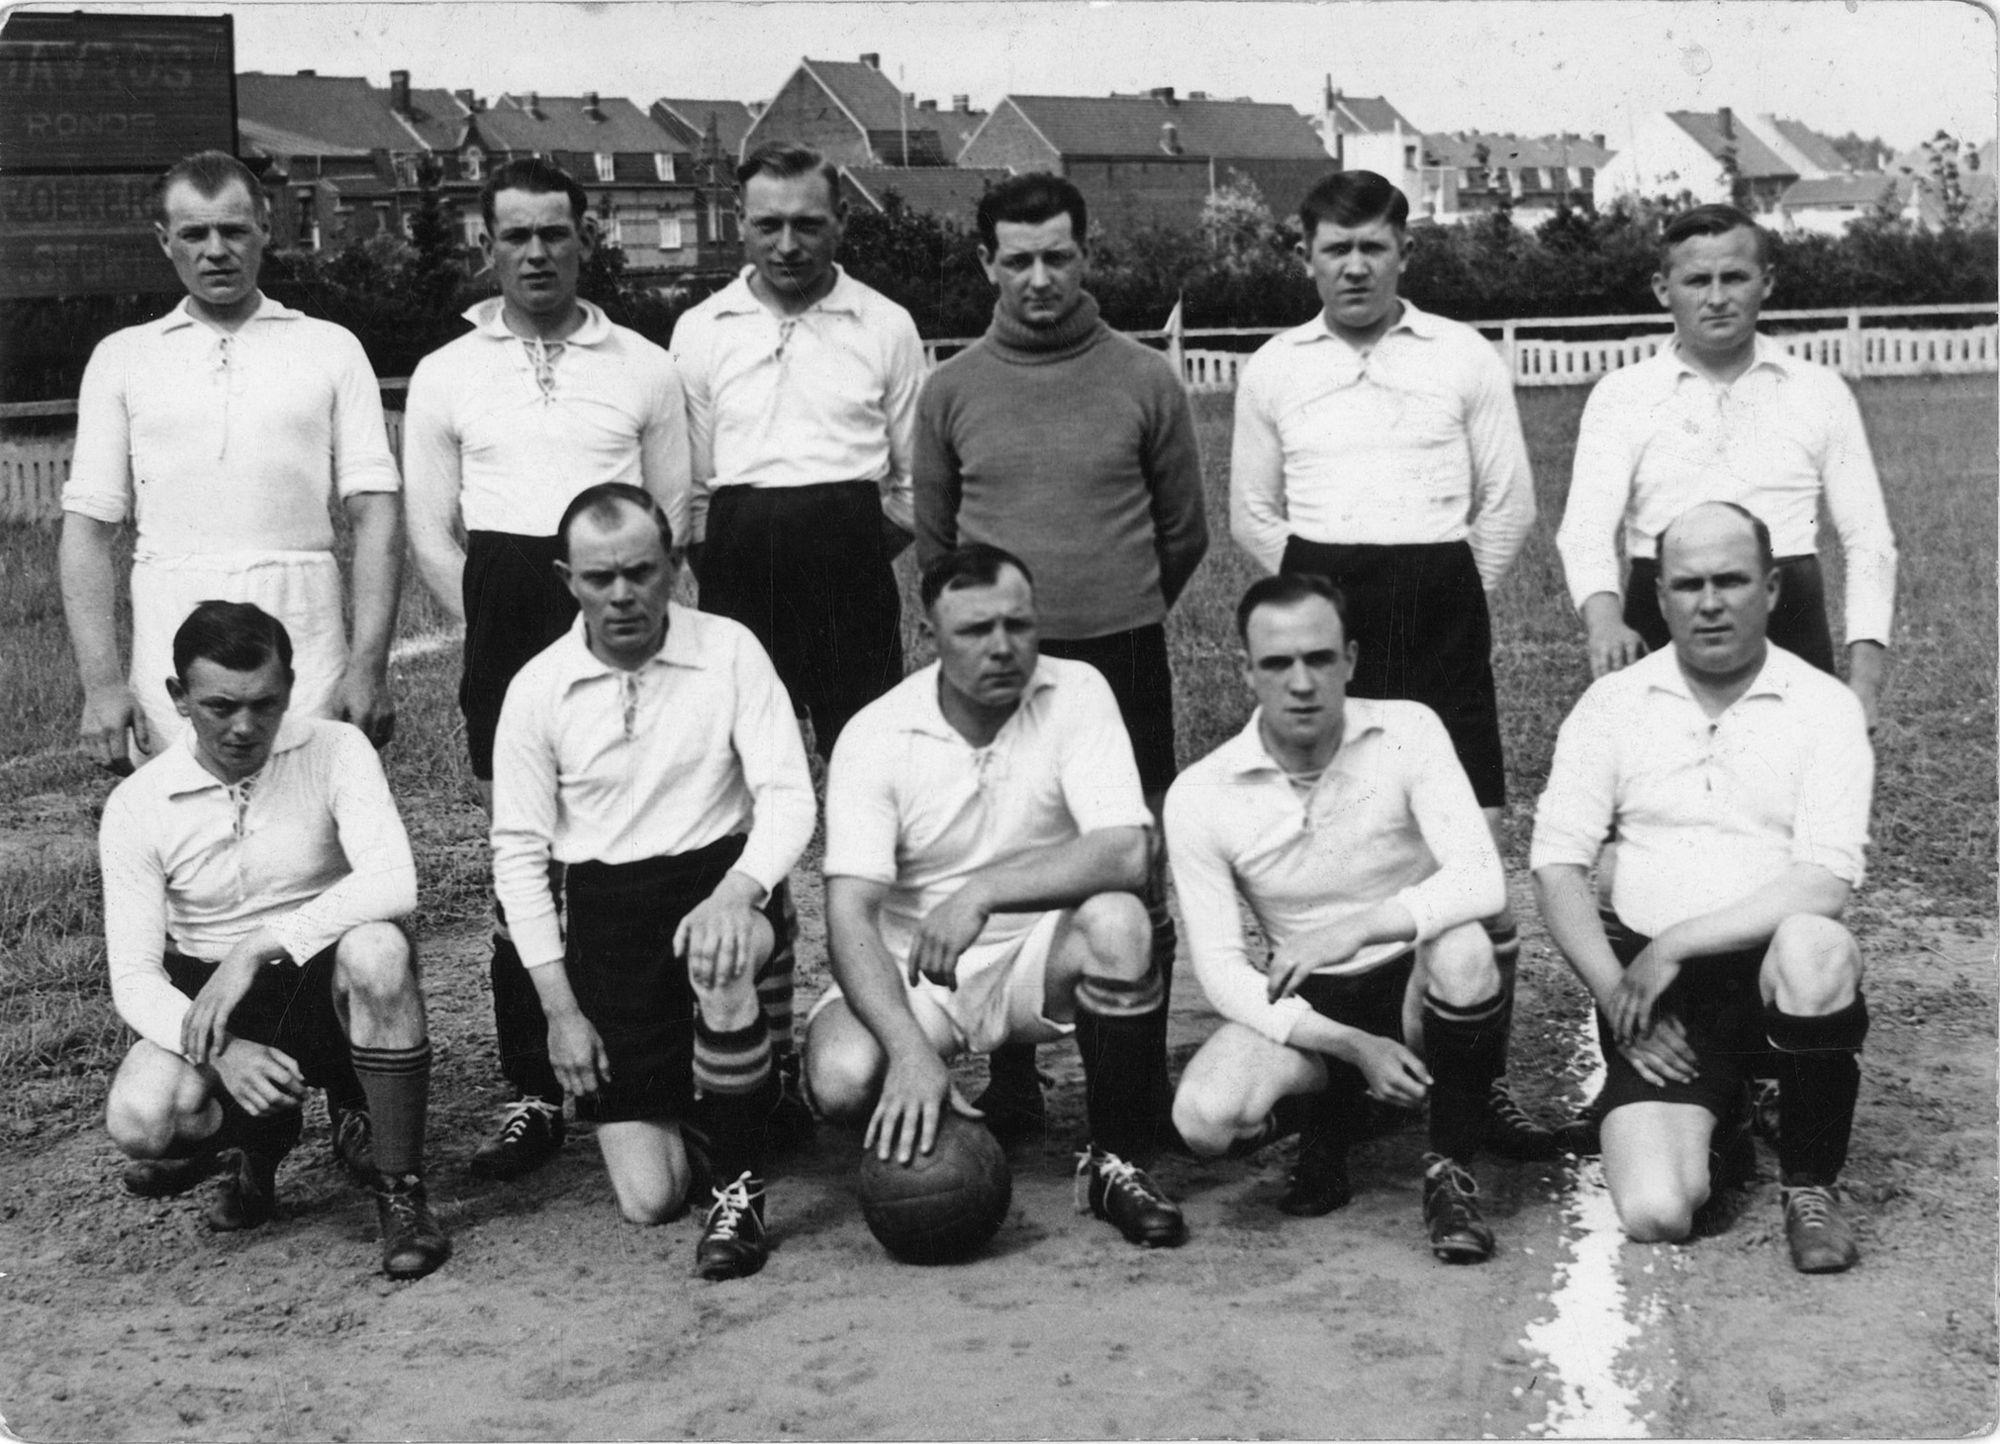 Voetbalploeg in 1937